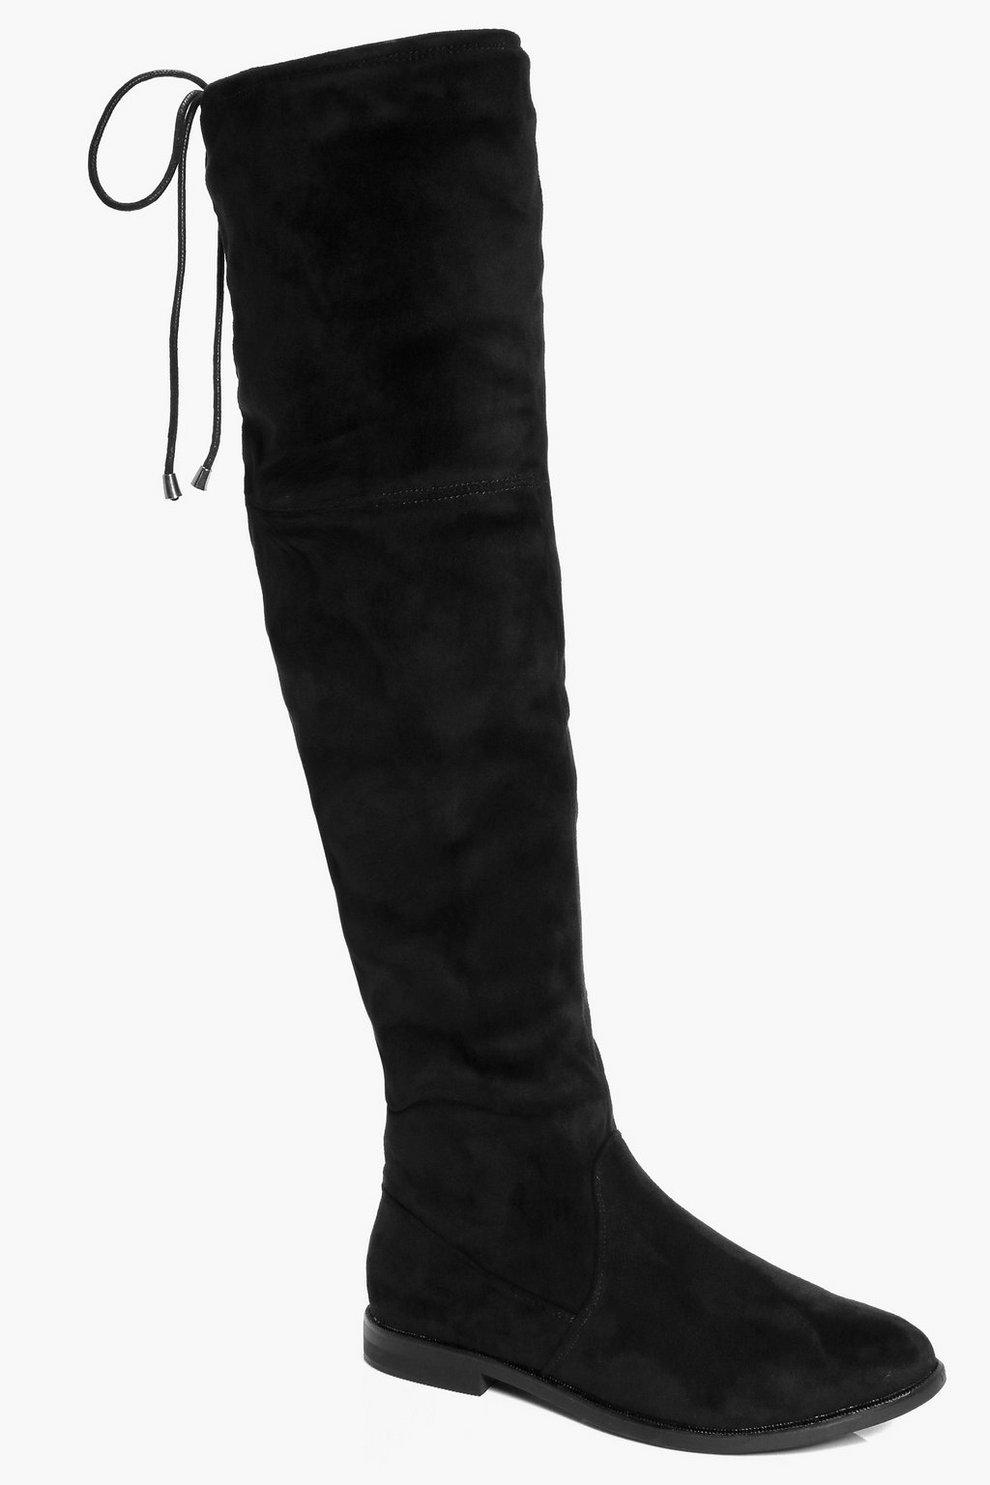 7dfedbec1b Tie Back Flat Over The Knee Boots | Boohoo